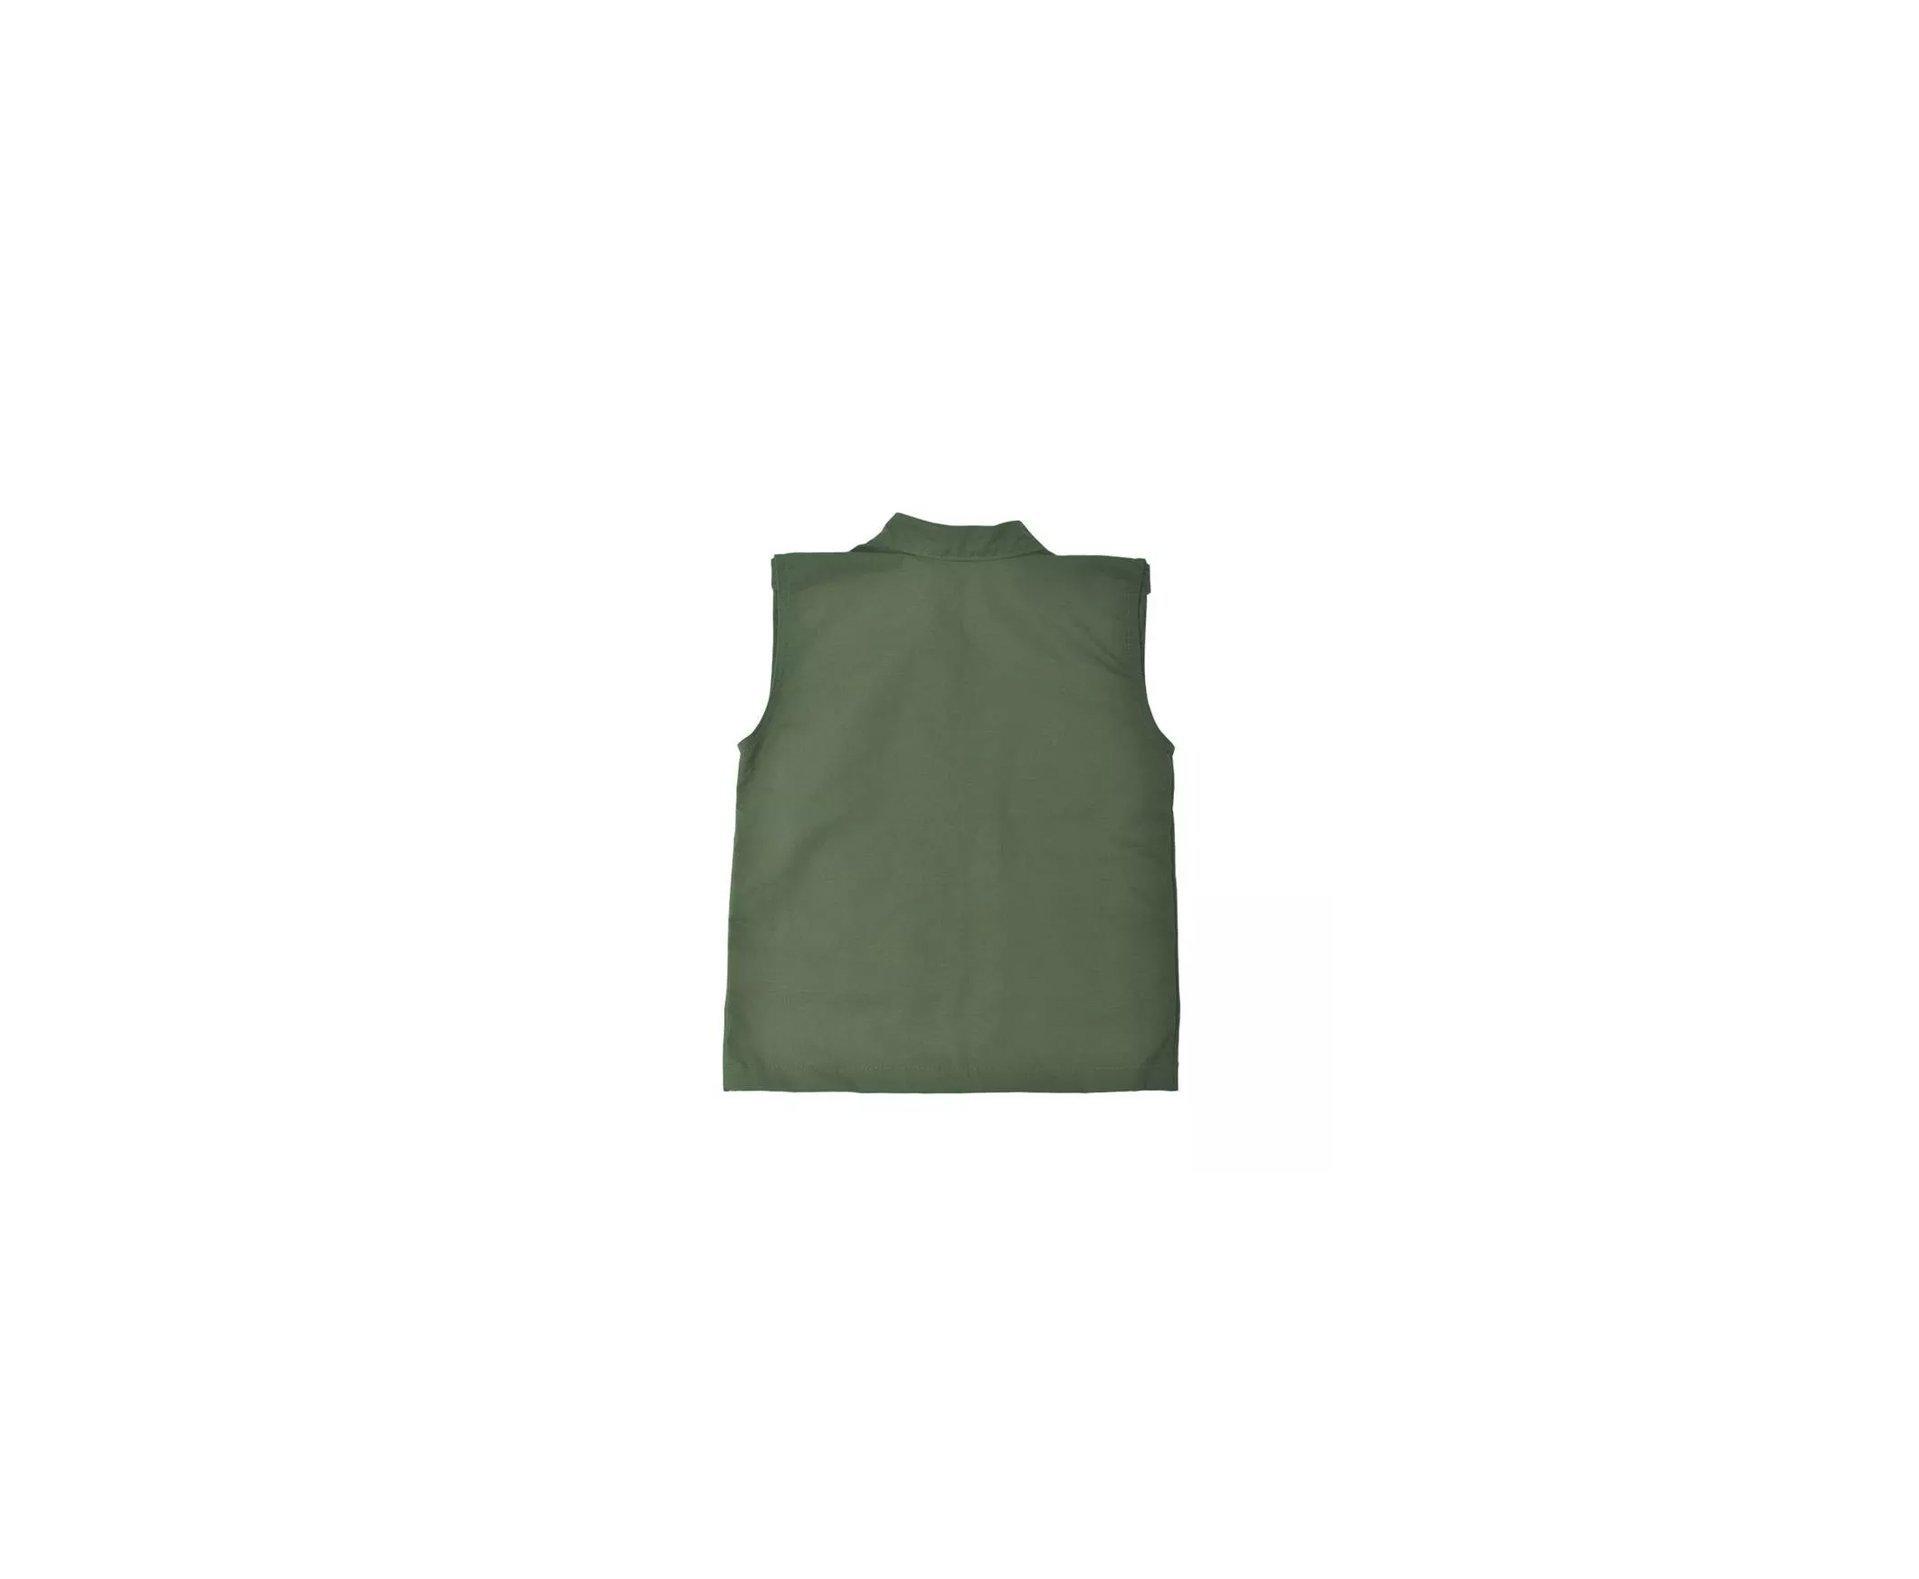 Colete Army Infantil Tt 9-verde Oliva Belica - M